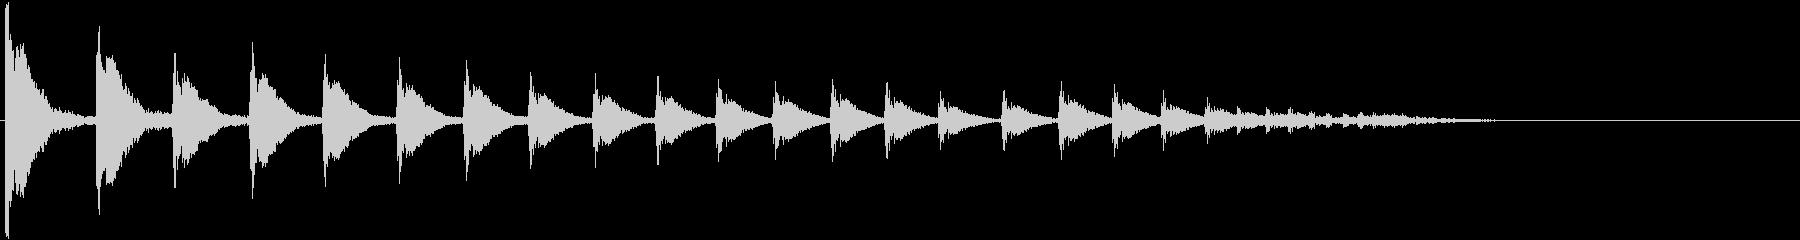 HIGH TOM:バウンスアクセン...の未再生の波形